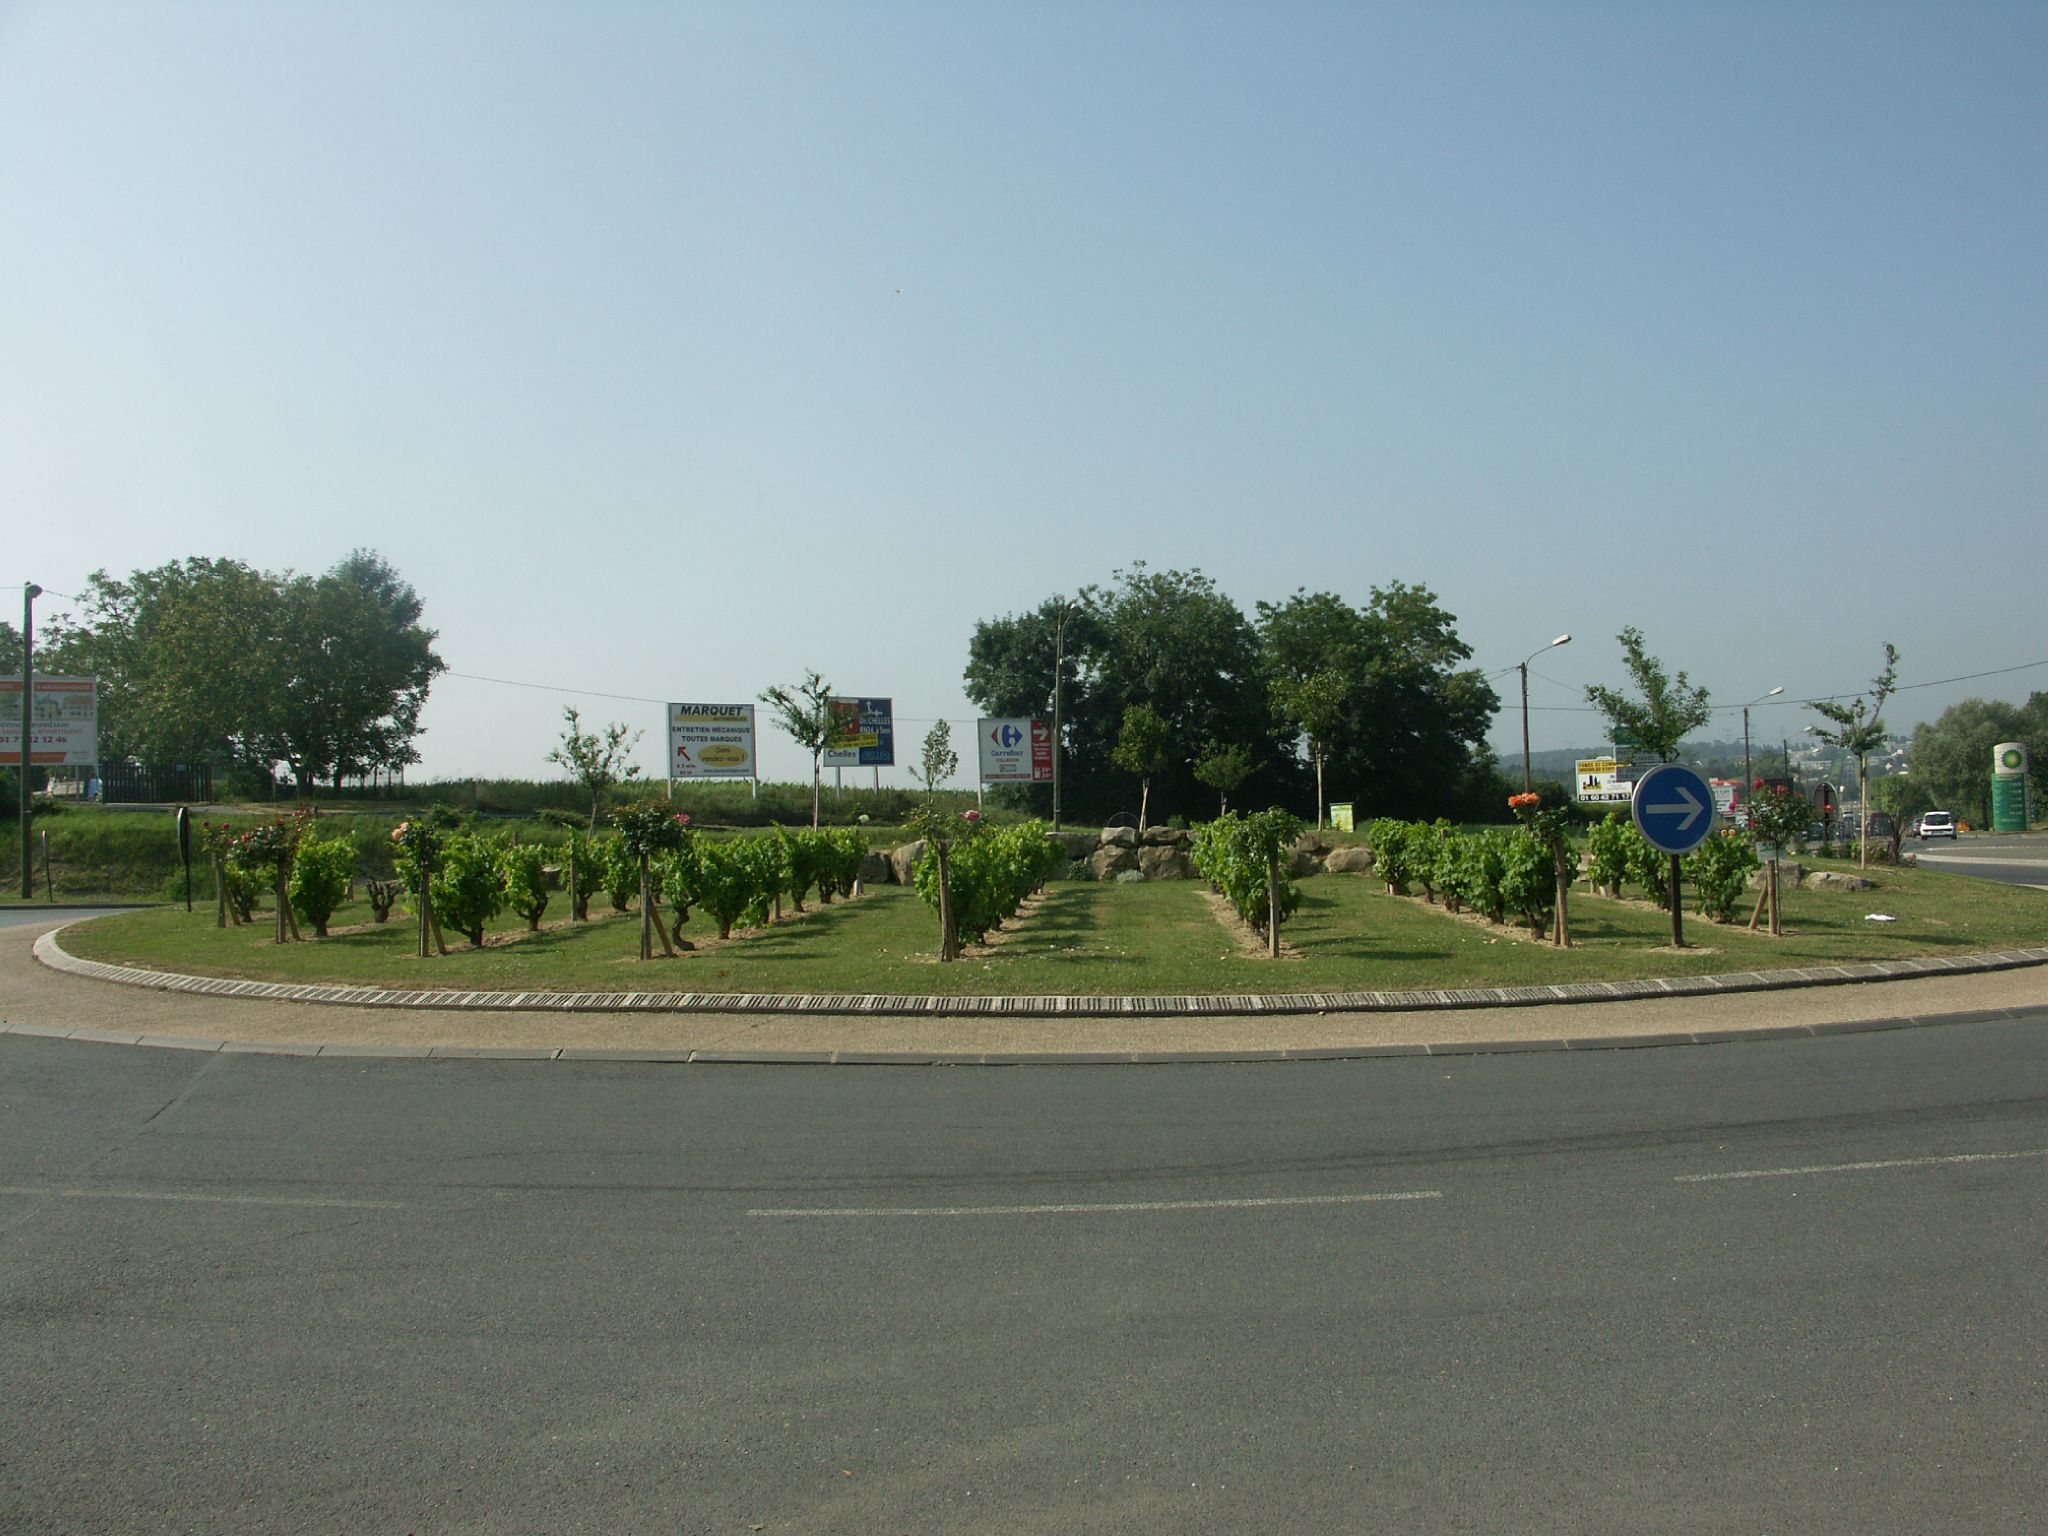 Magasin saint thibault des vignes for Garage volkswagen st thibault des vignes